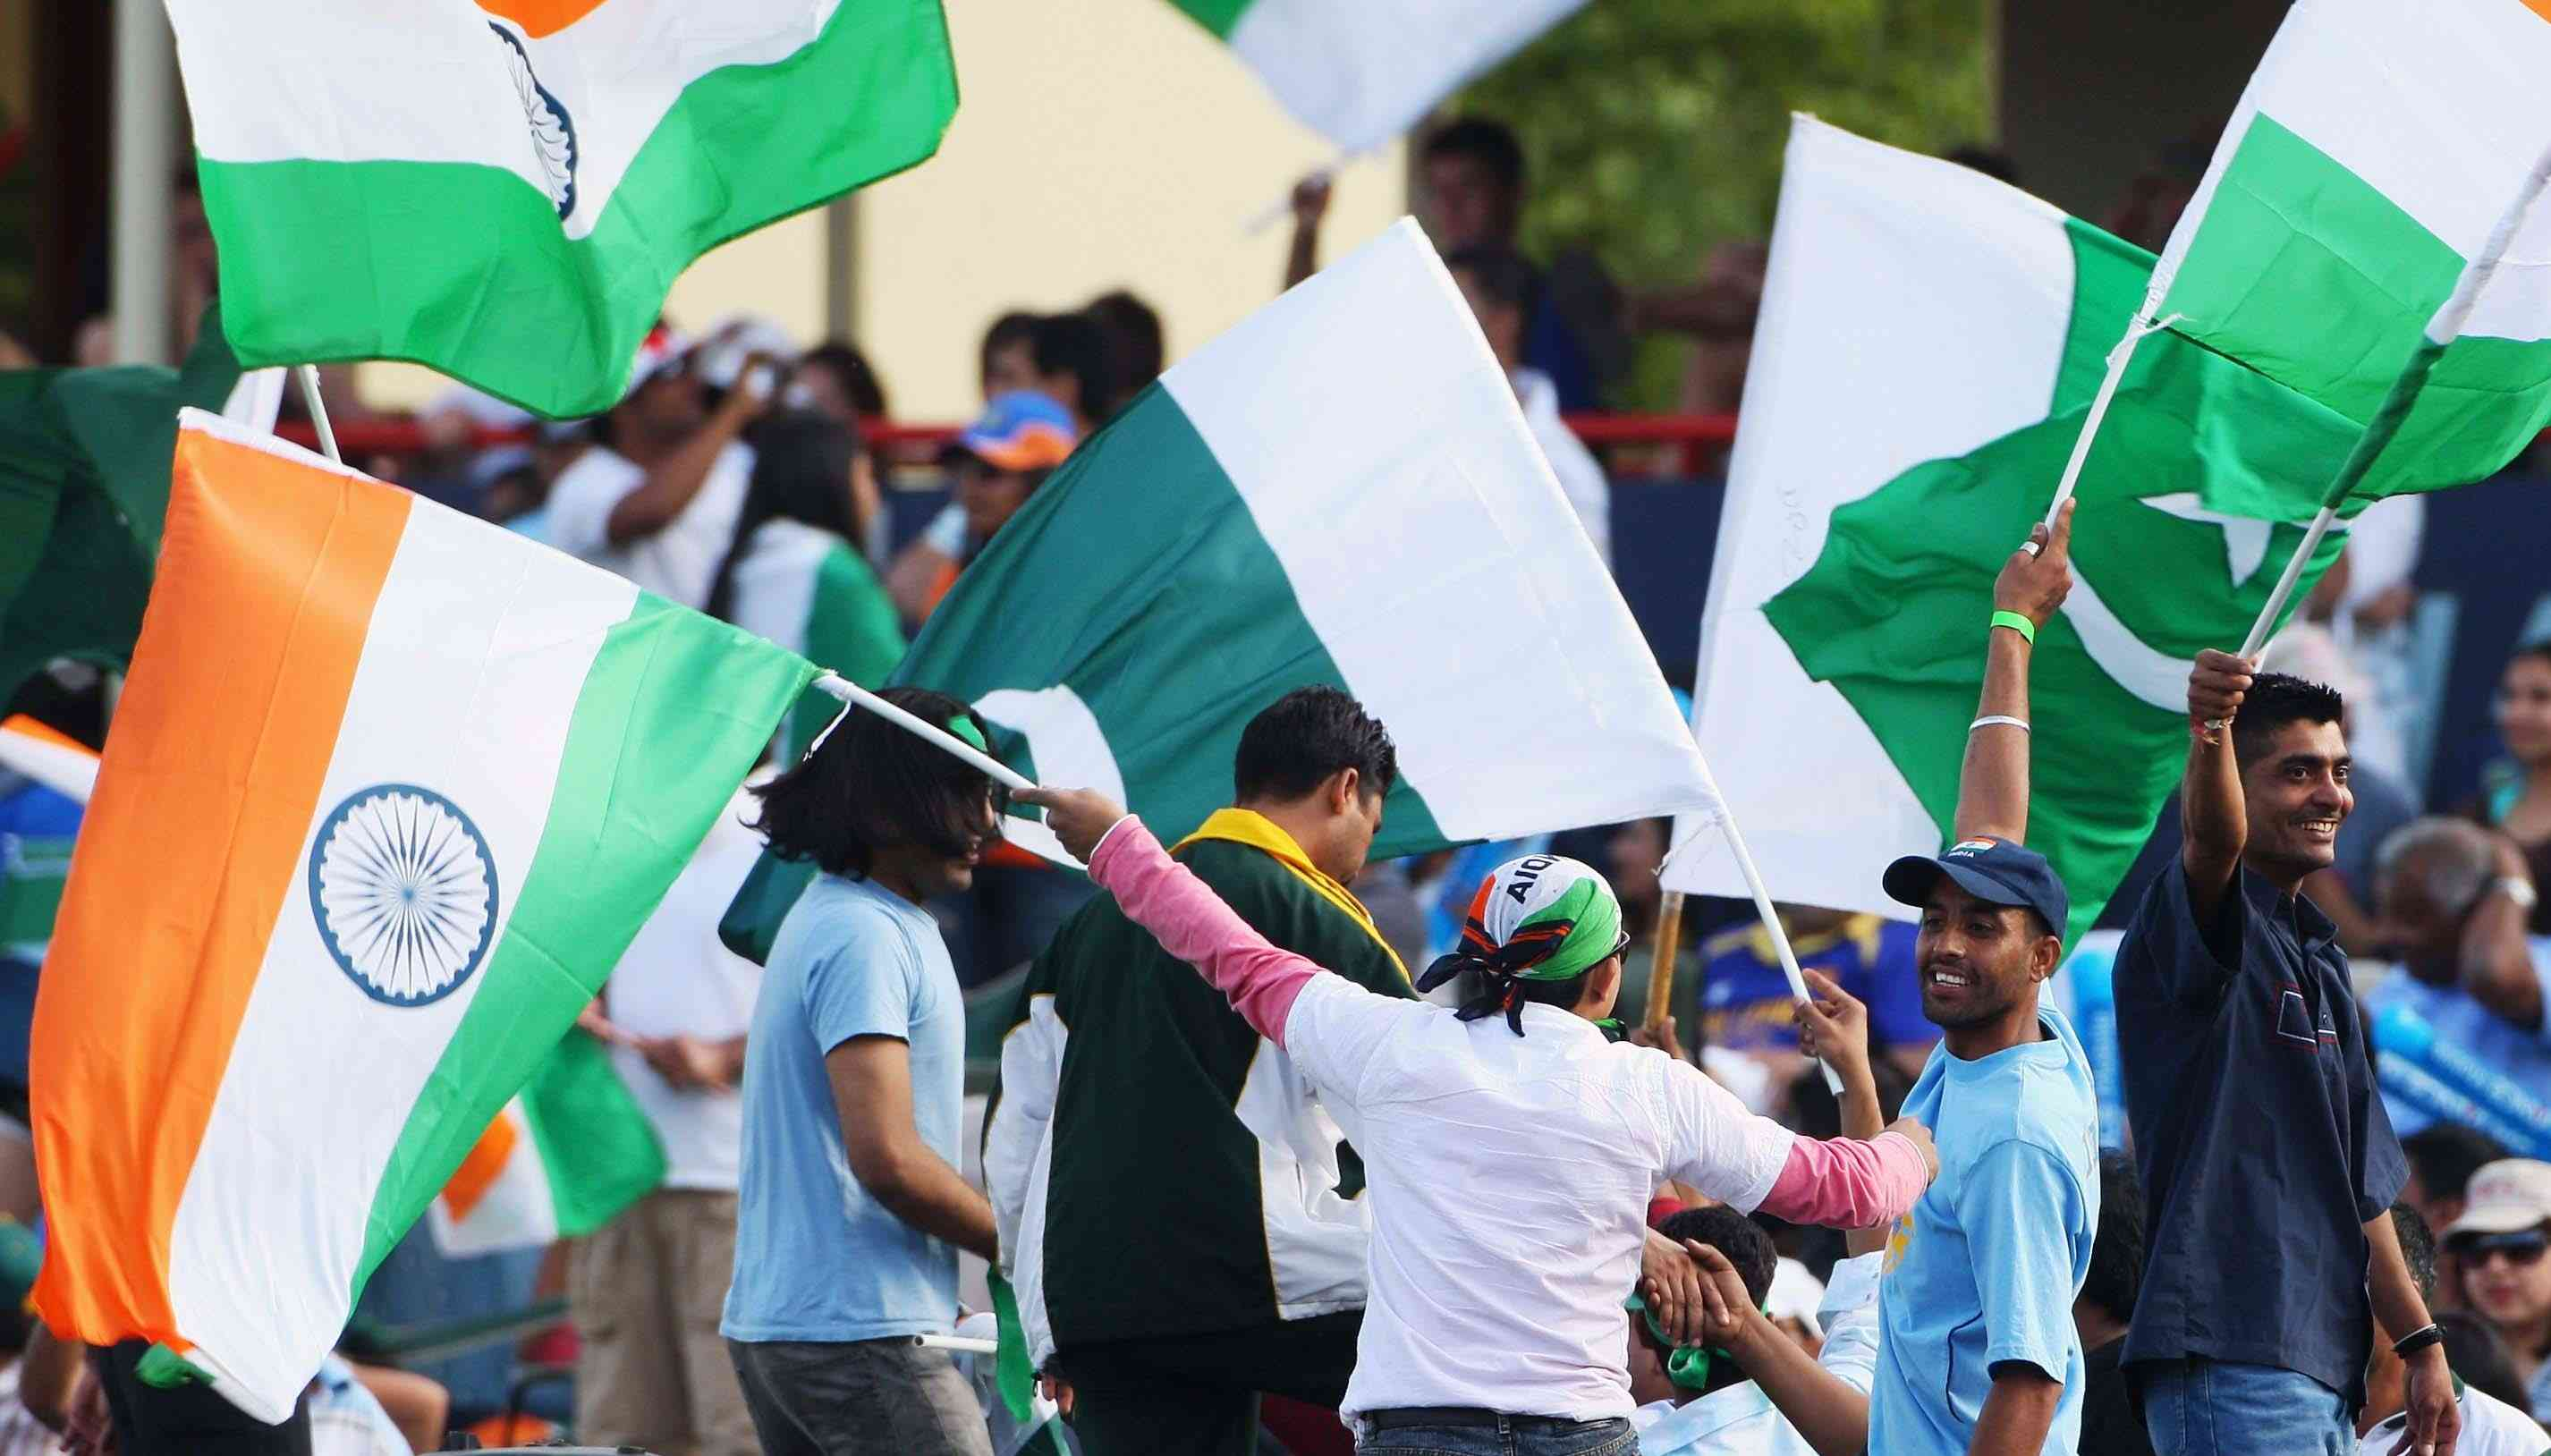 India and Pakistan should play each other - Satya Hindi